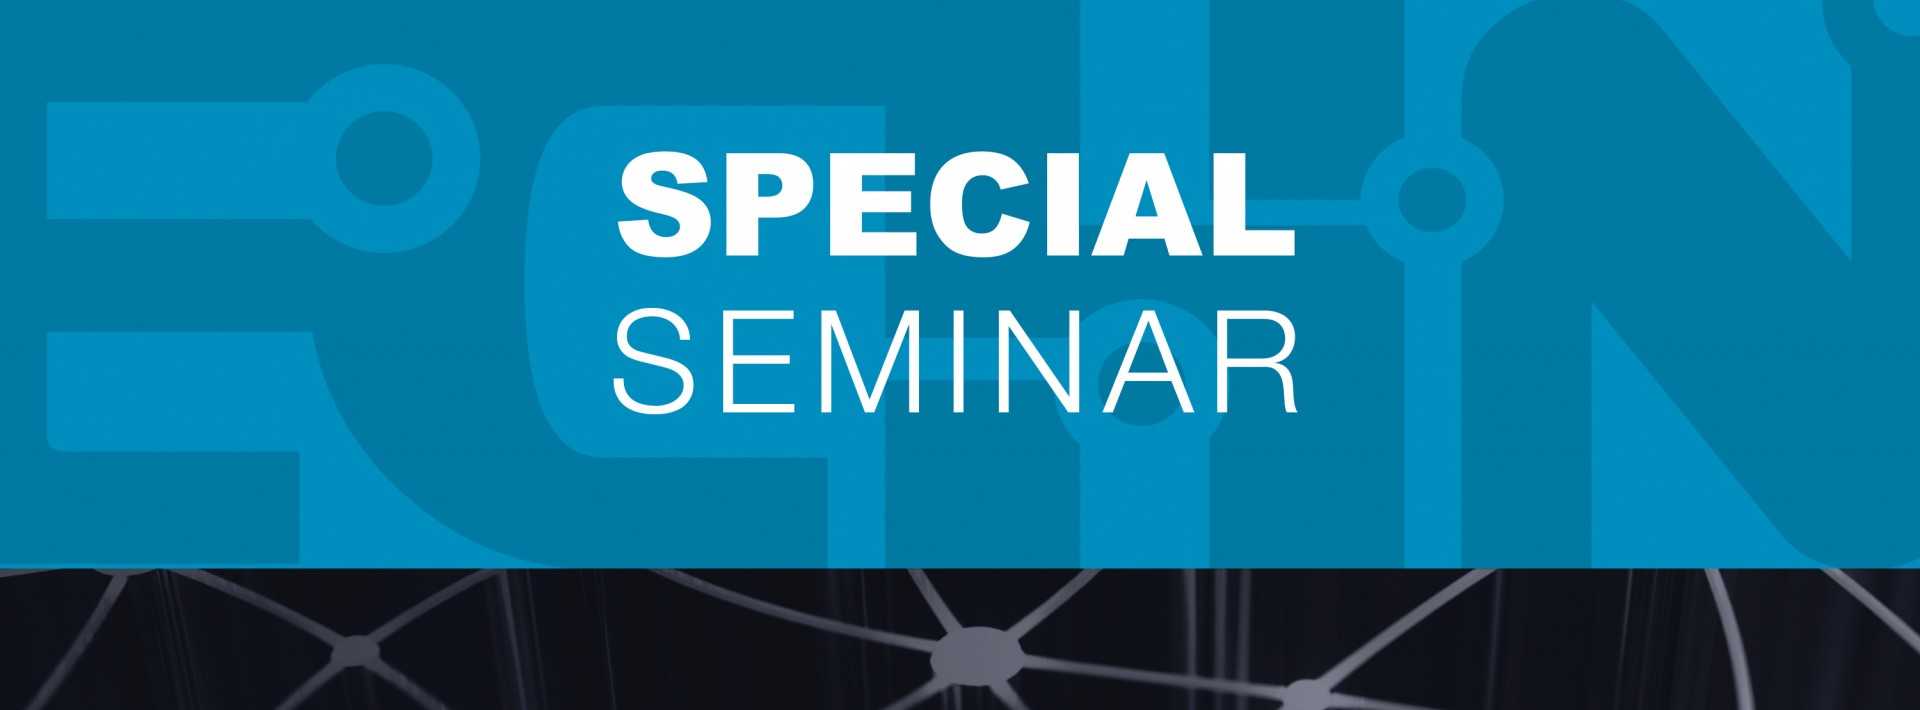 special seminar text graphic button